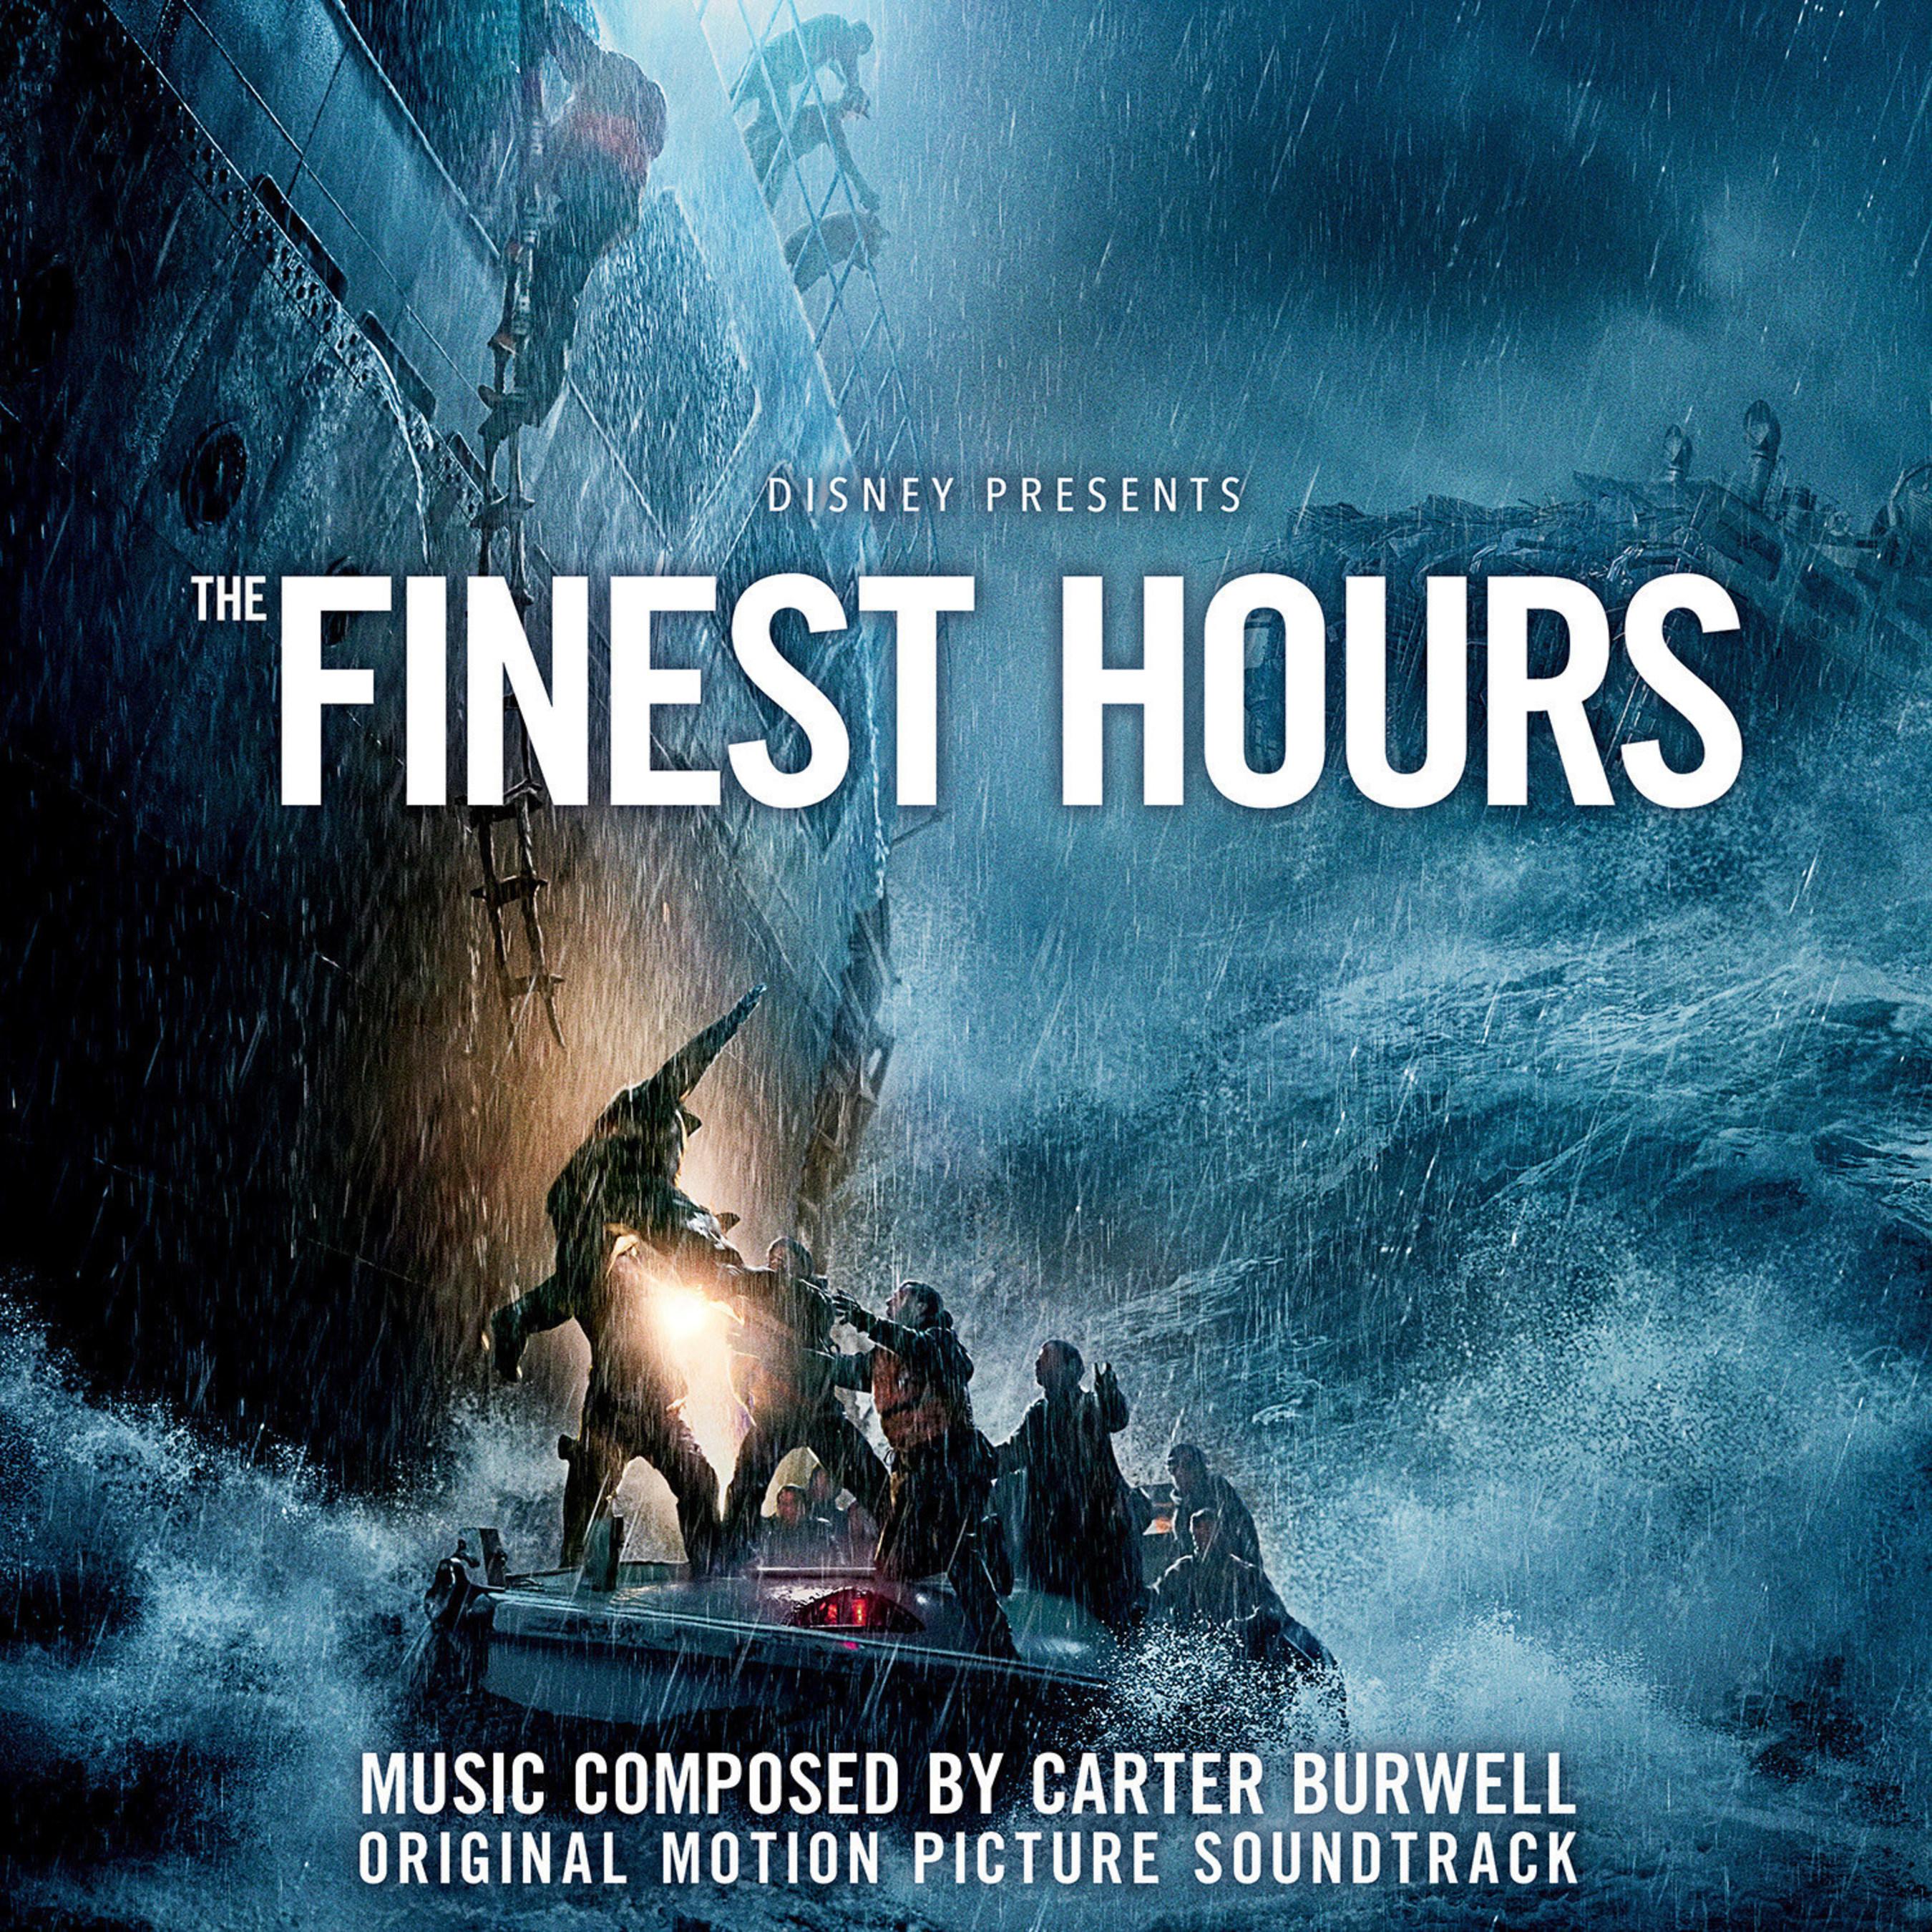 Walt Disney Records Set To Release 'The Finest Hours' Original Motion Picture Soundtrack